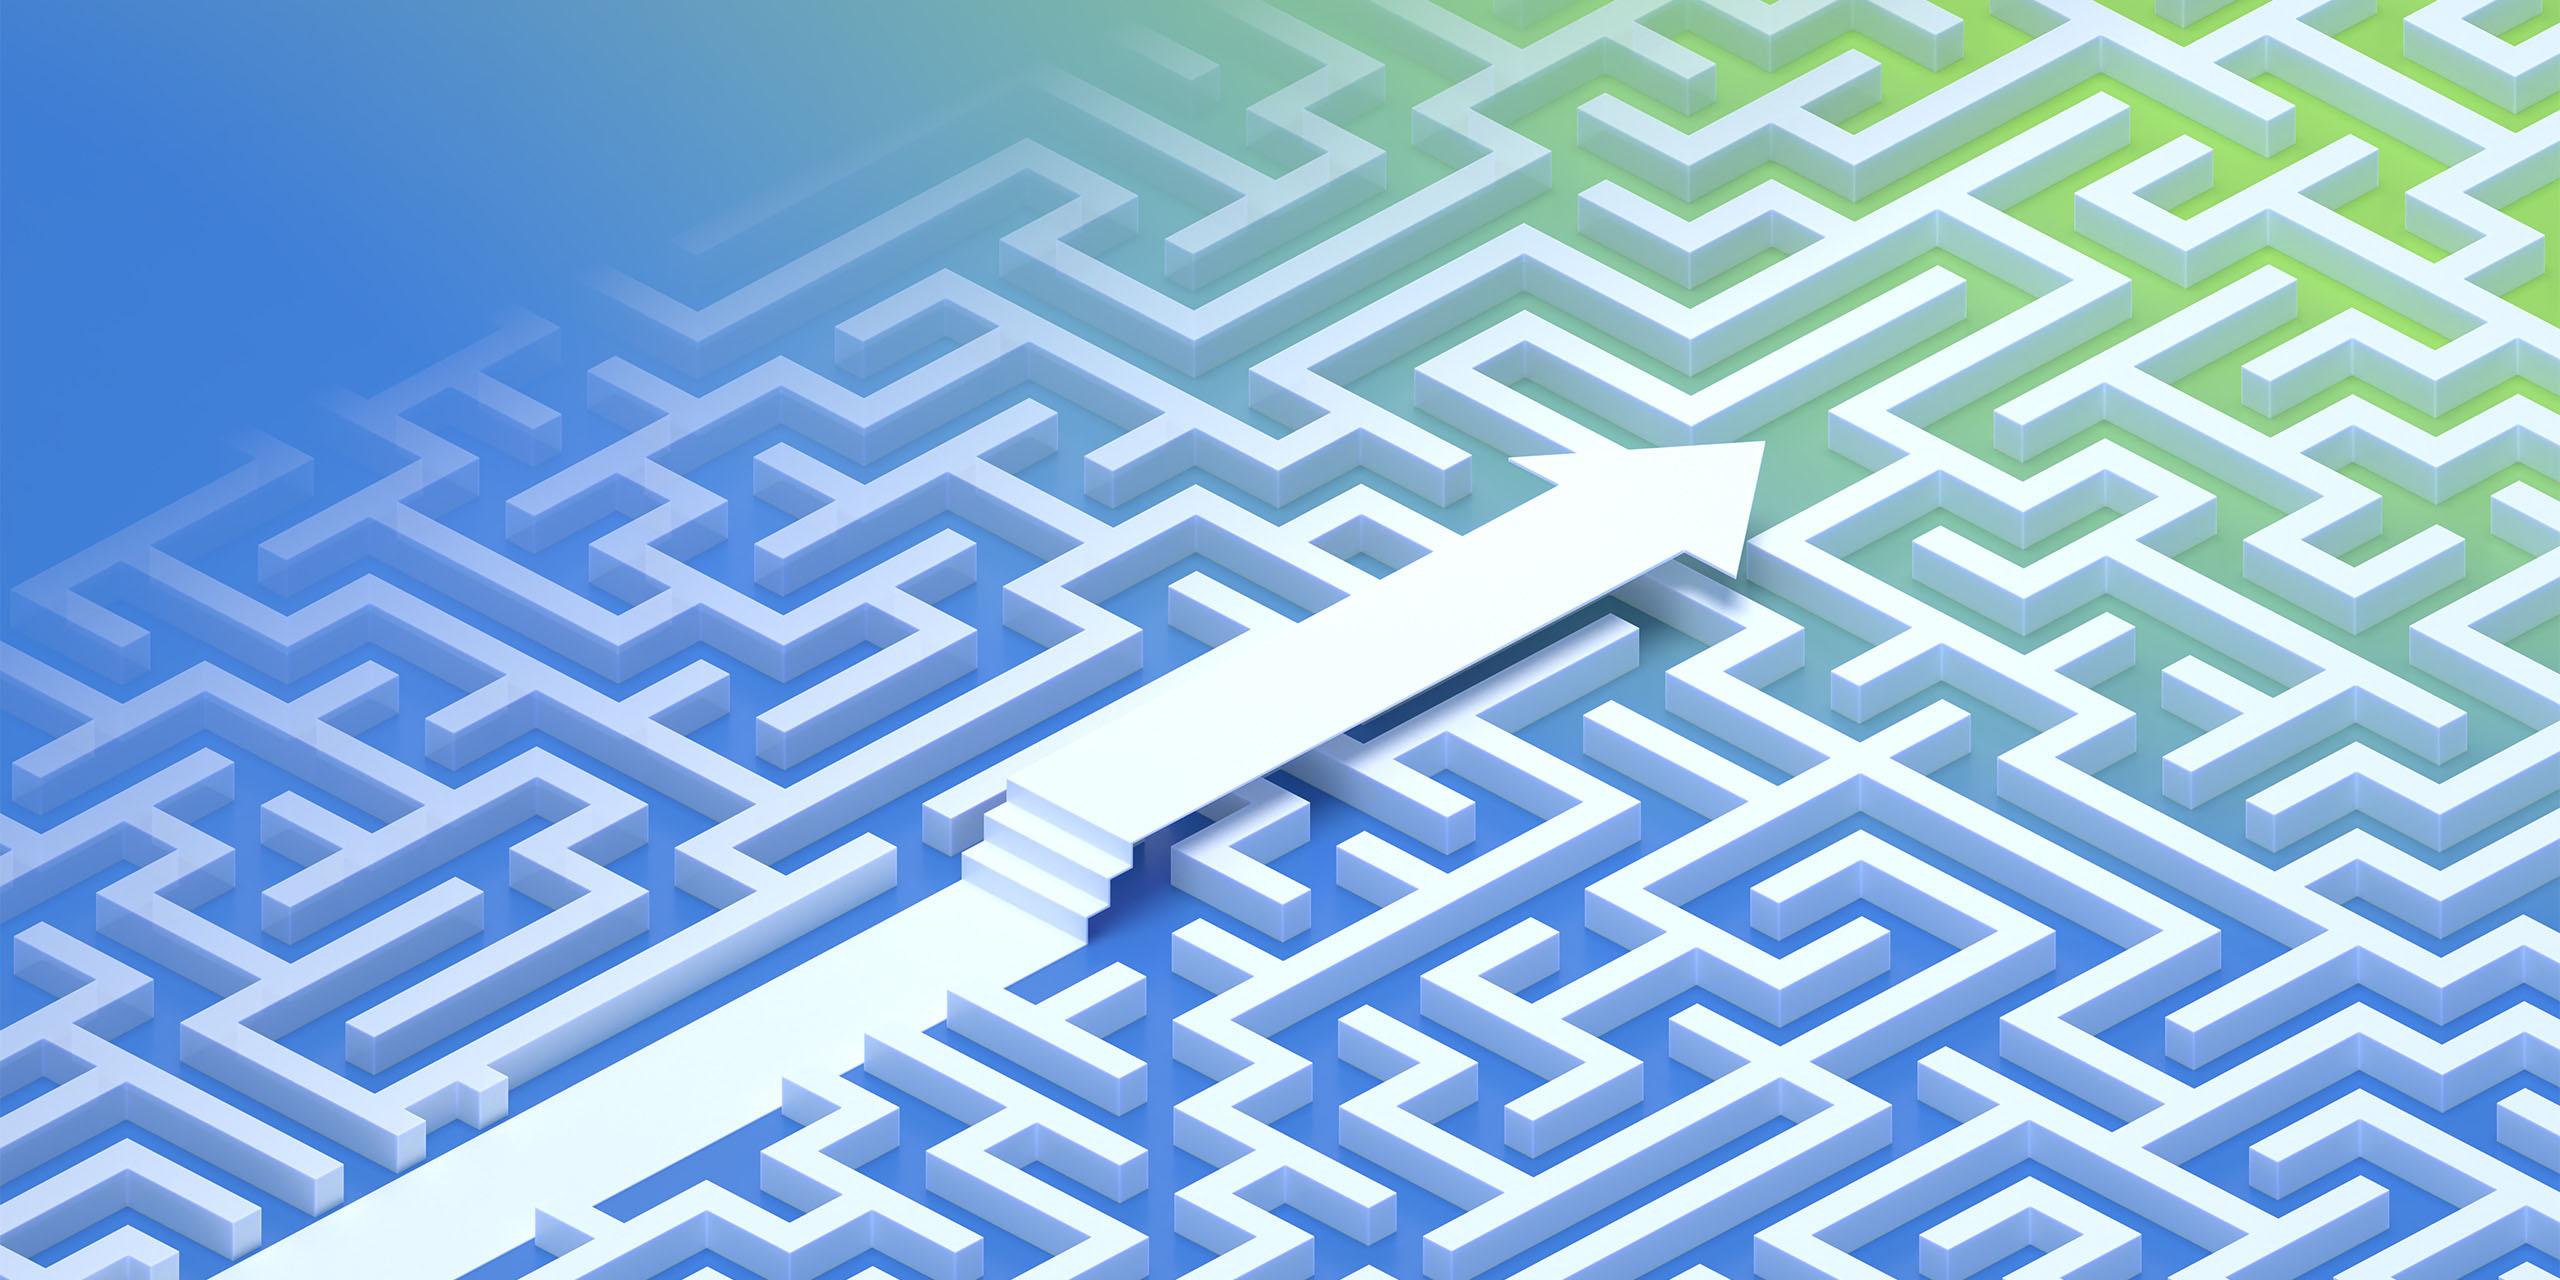 Warranty Reimbursement Concentration for Fourth Quarter 2020